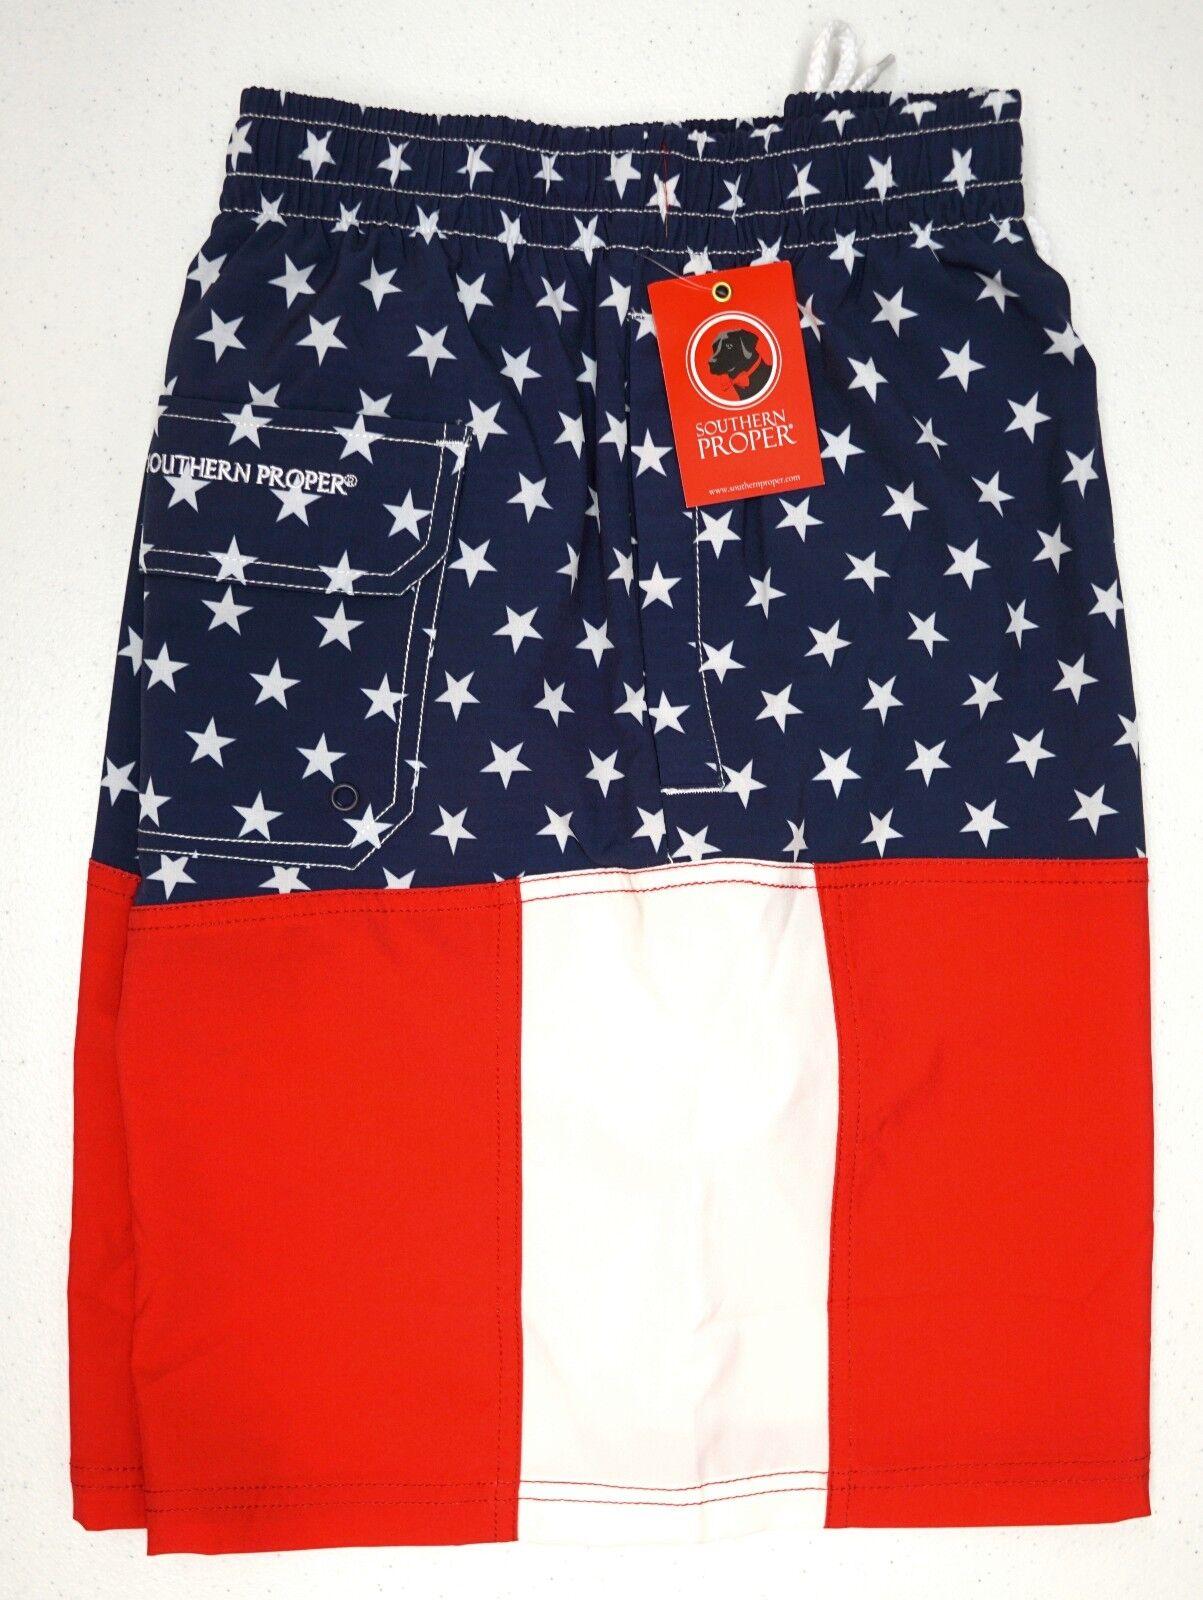 NWT  Southern Proper Red White bluee Stars Stripes Swim Trunks Mens XL XXL NEW